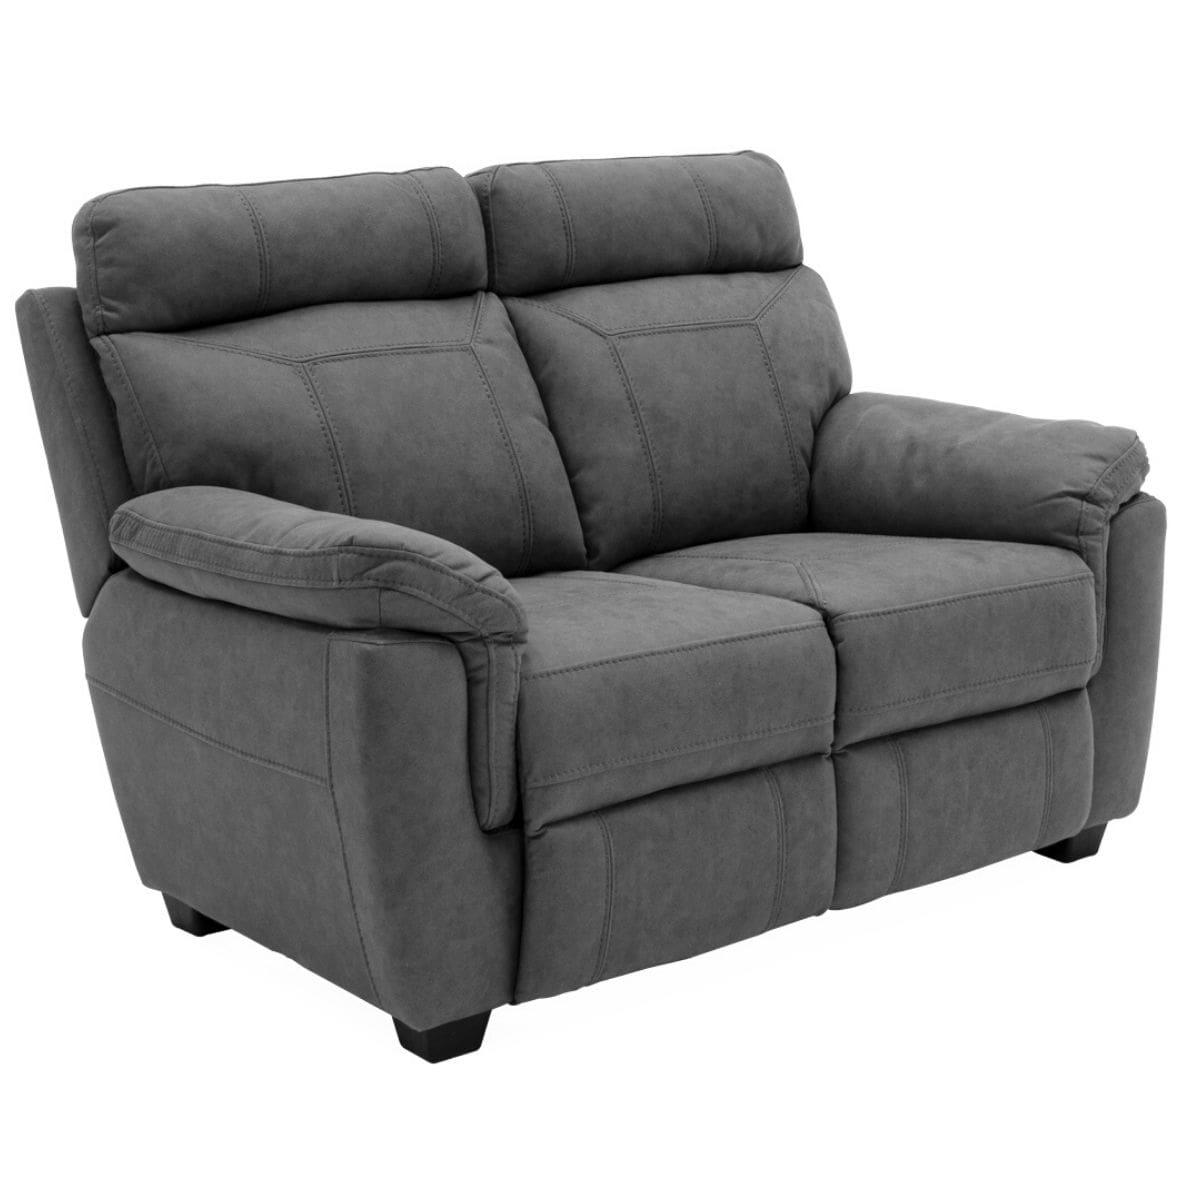 Bianca 2 Seater Sofa